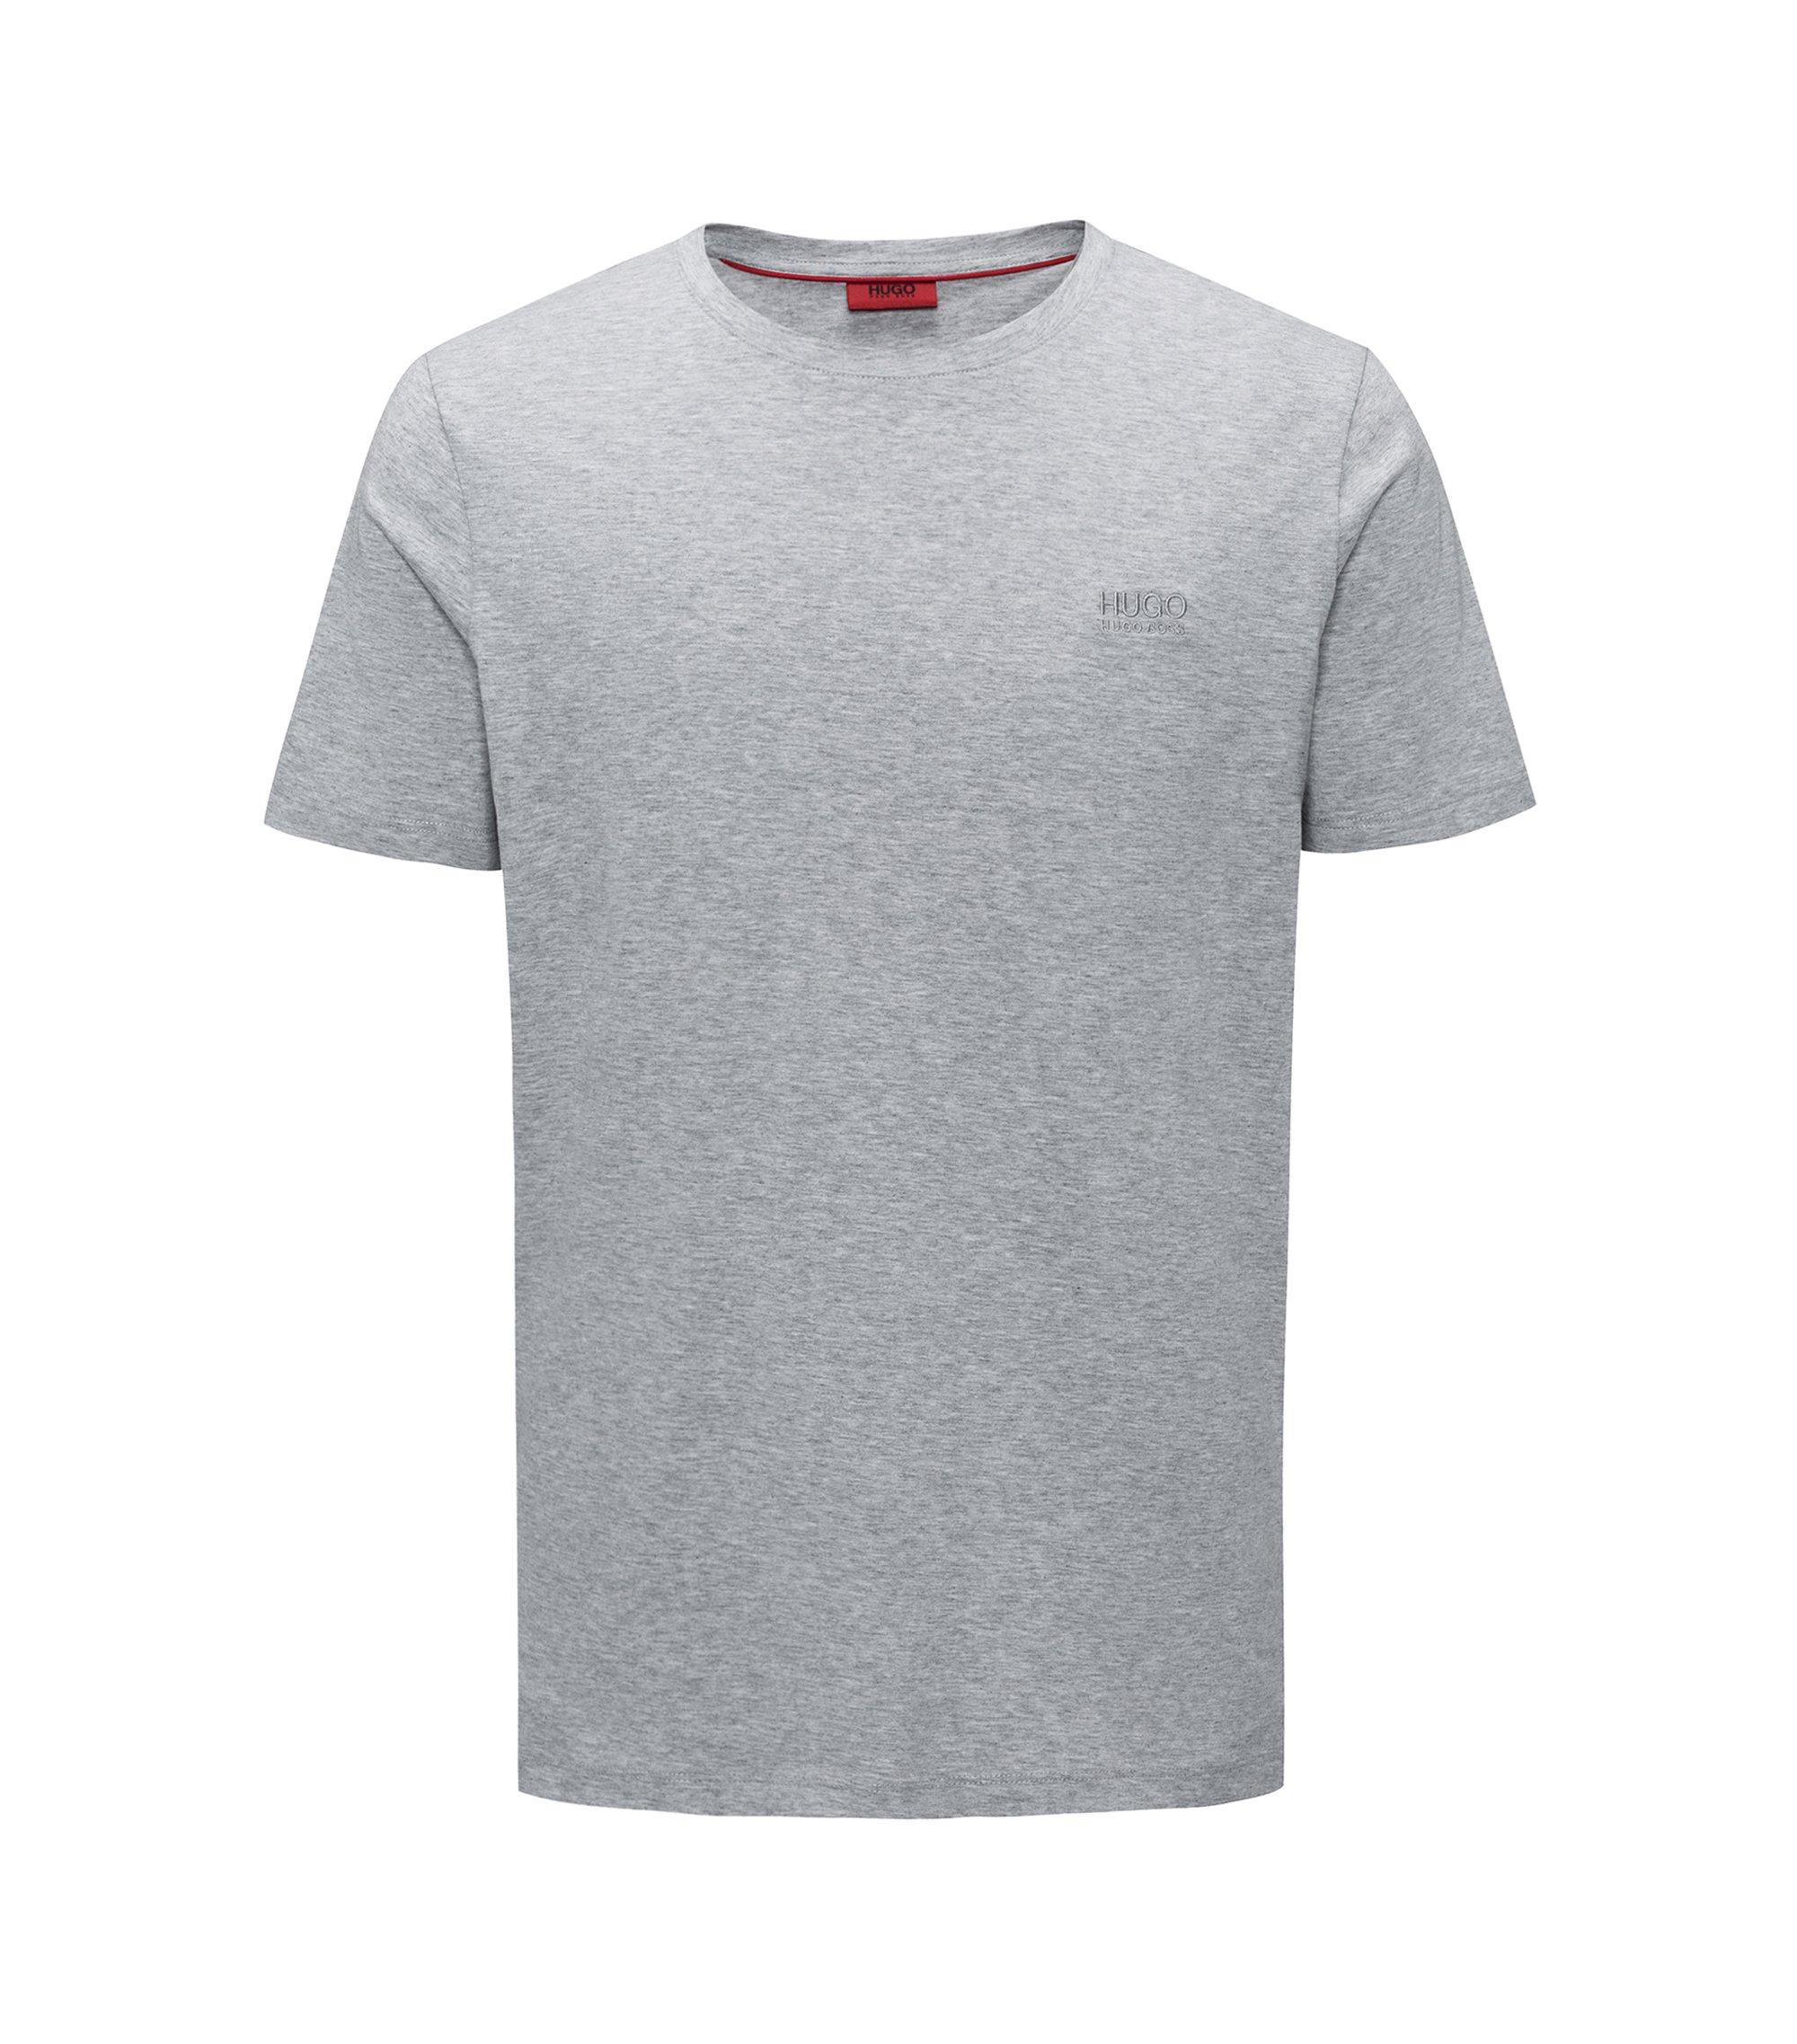 T-shirt regular fit in morbido cotone con logo, Grigio scuro